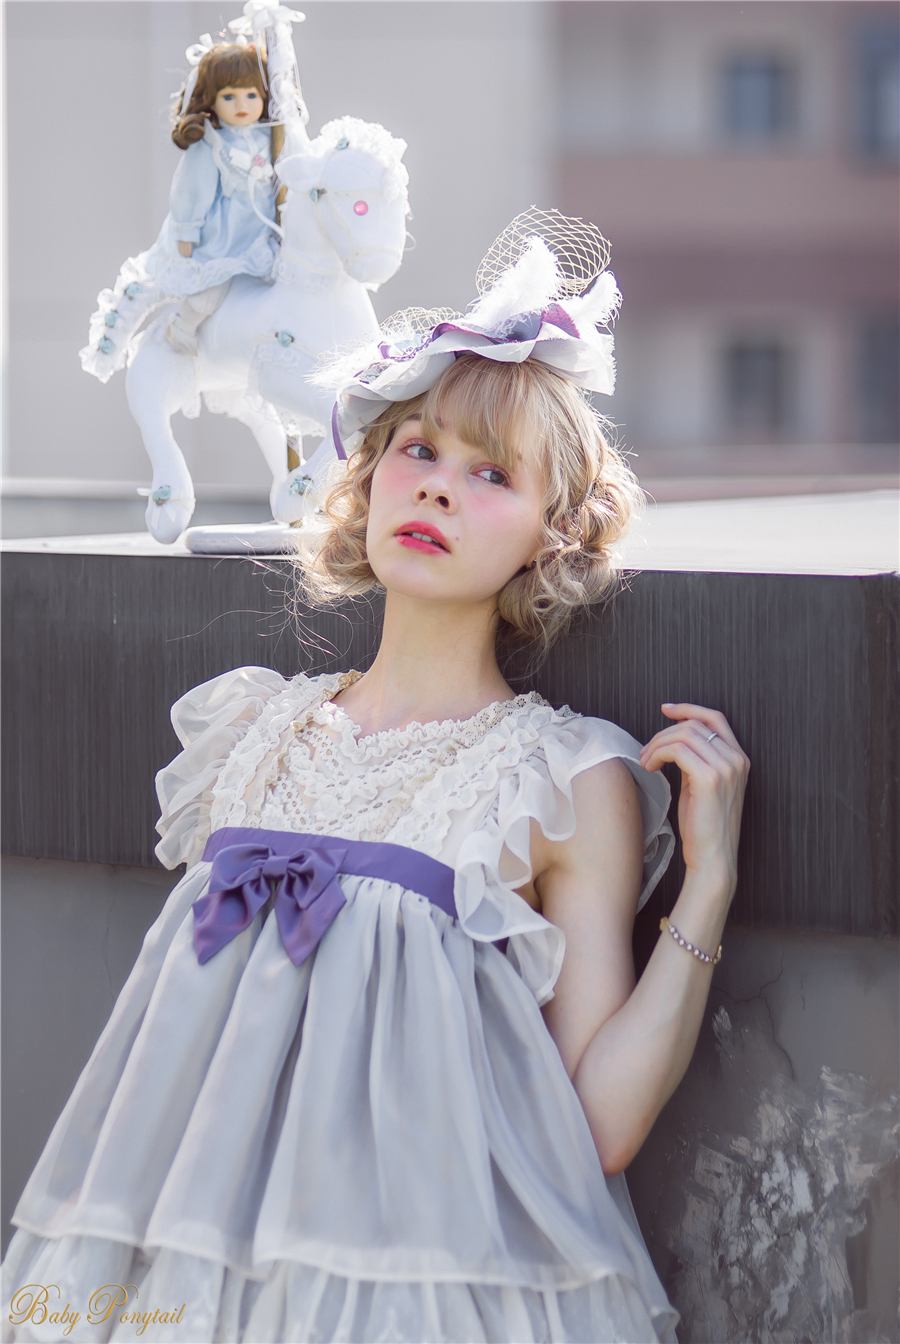 Babyponytail_Present Angel_JSK_Claudia1.jpg